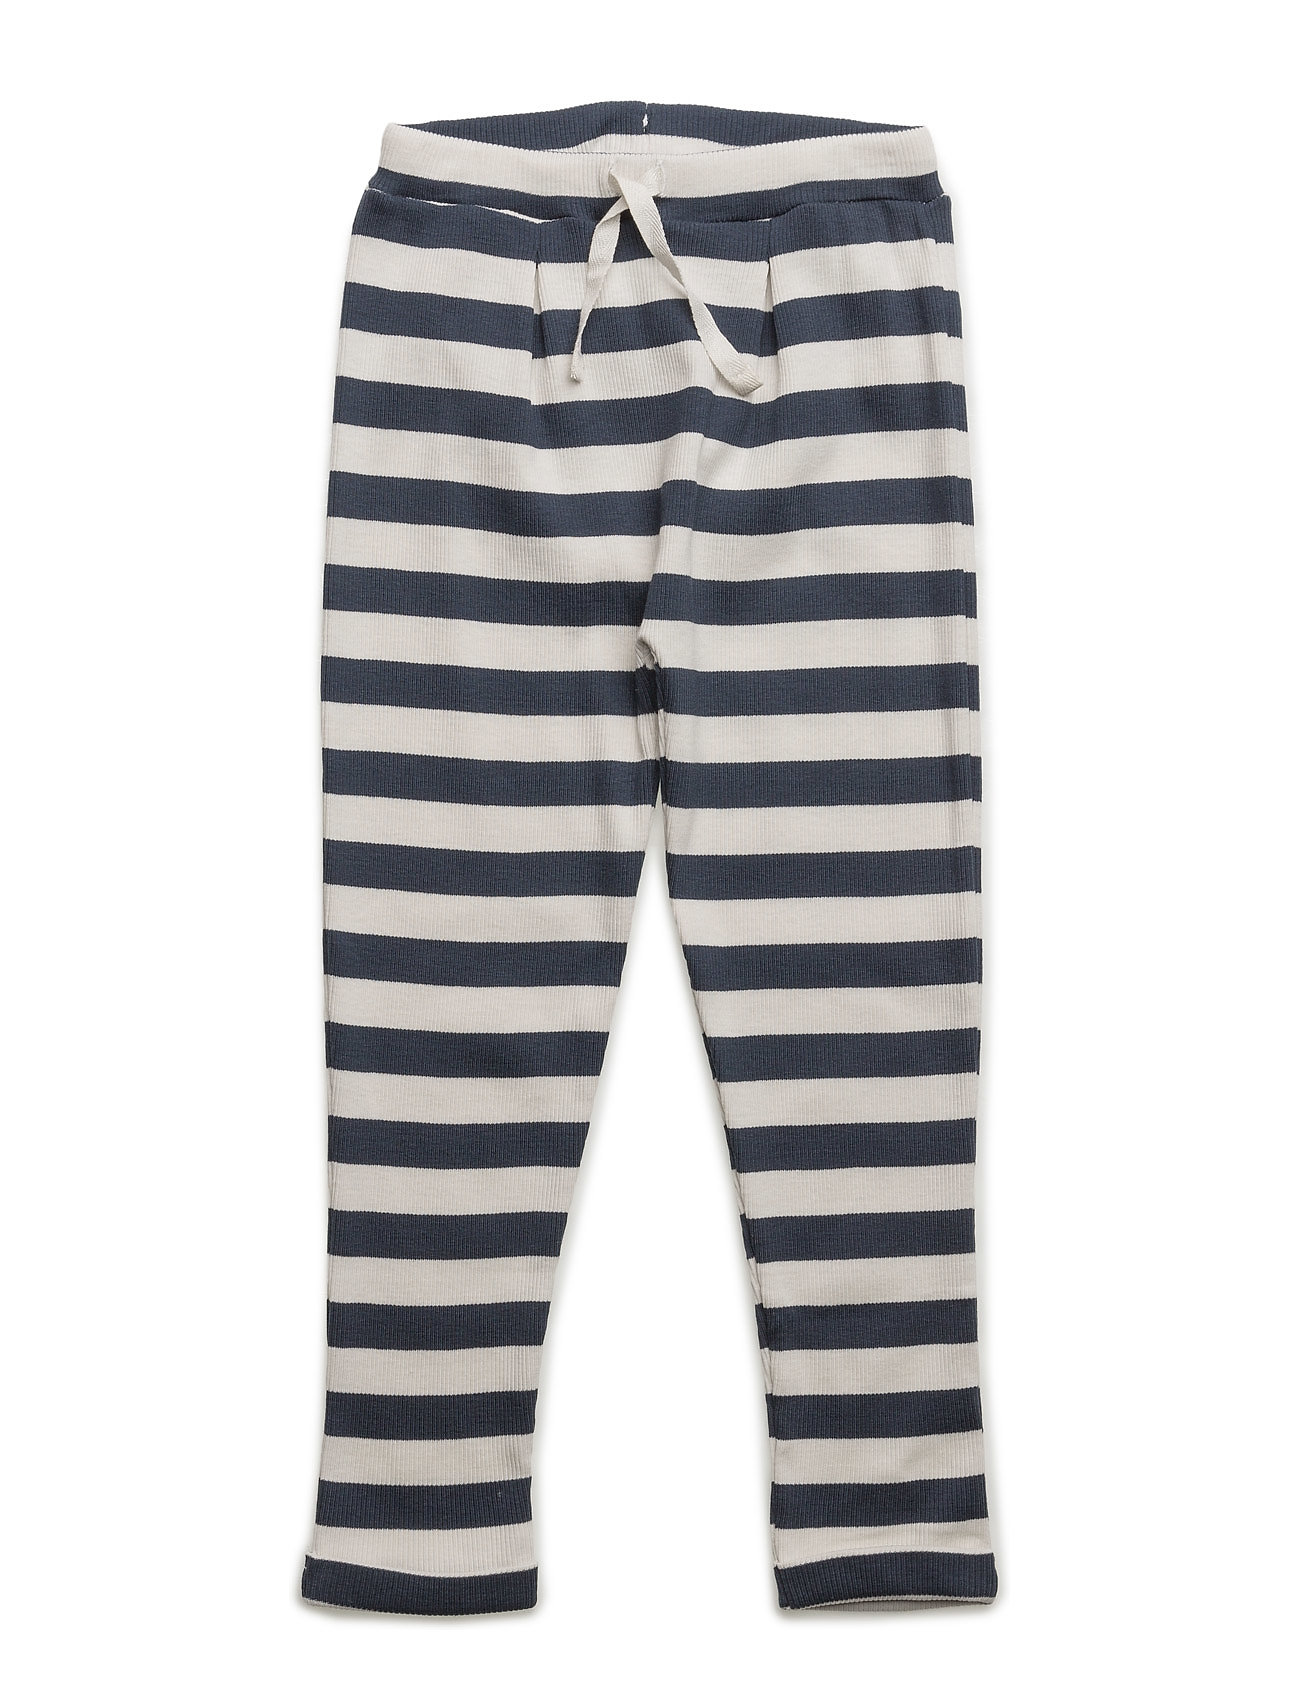 Trousers Noa Noa Miniature  til Børn i